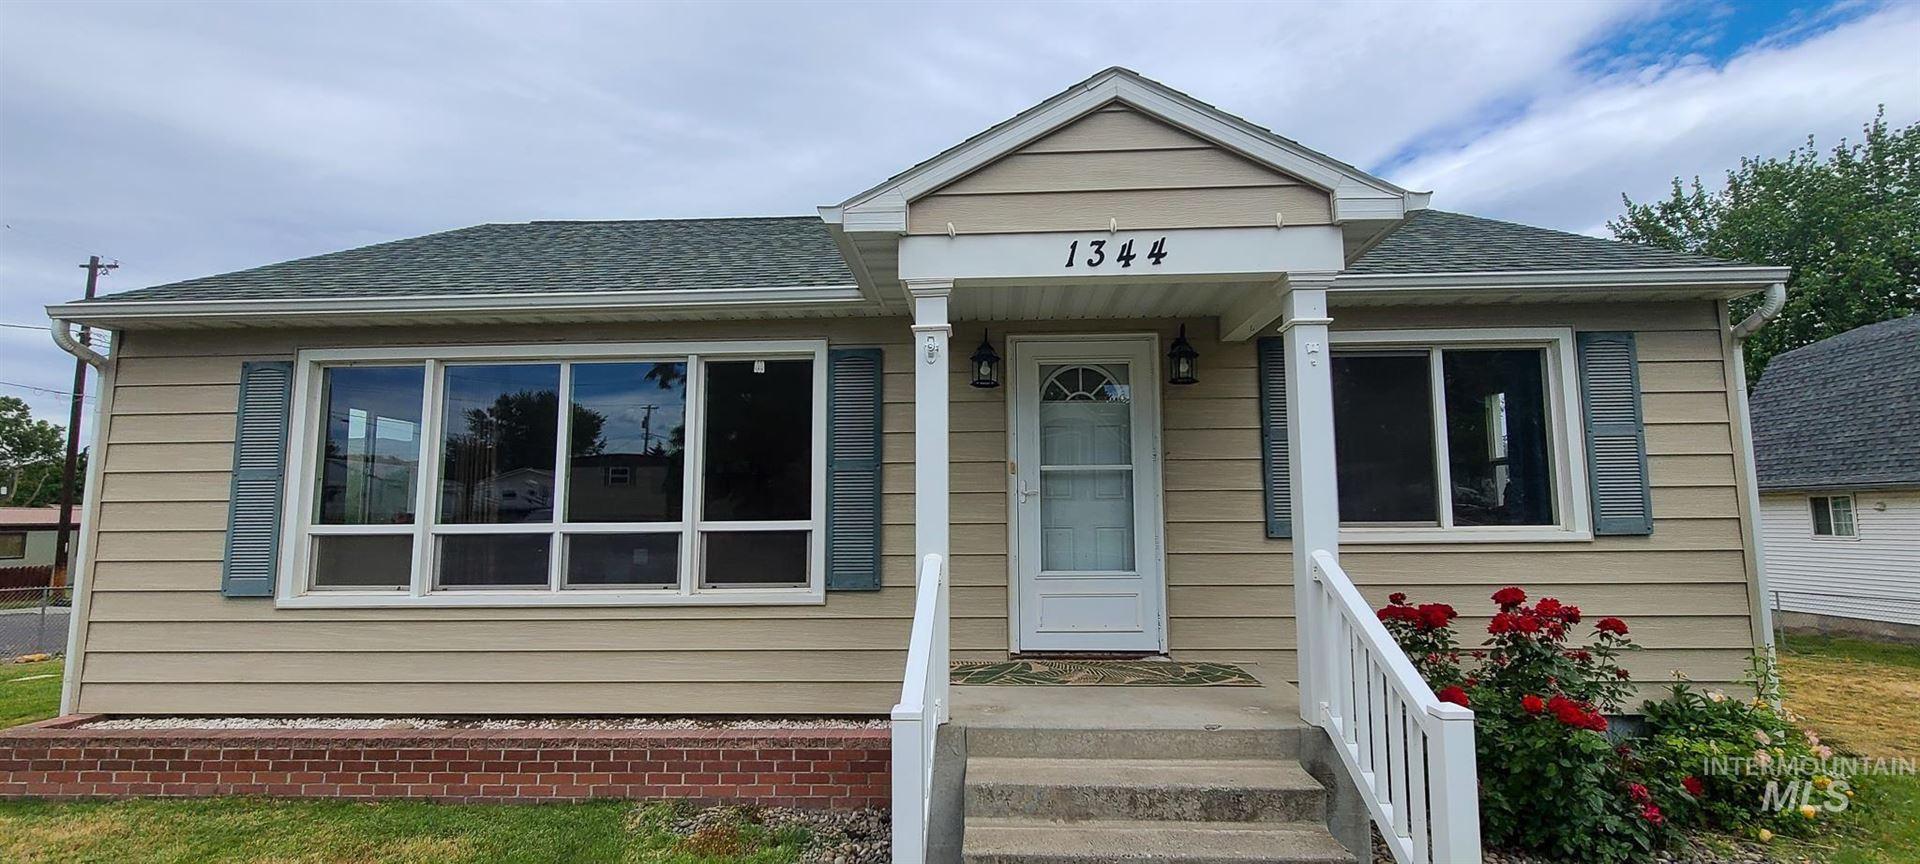 Photo of 1344 Libby Street, Clarkston, WA 99403-2438 (MLS # 98806996)